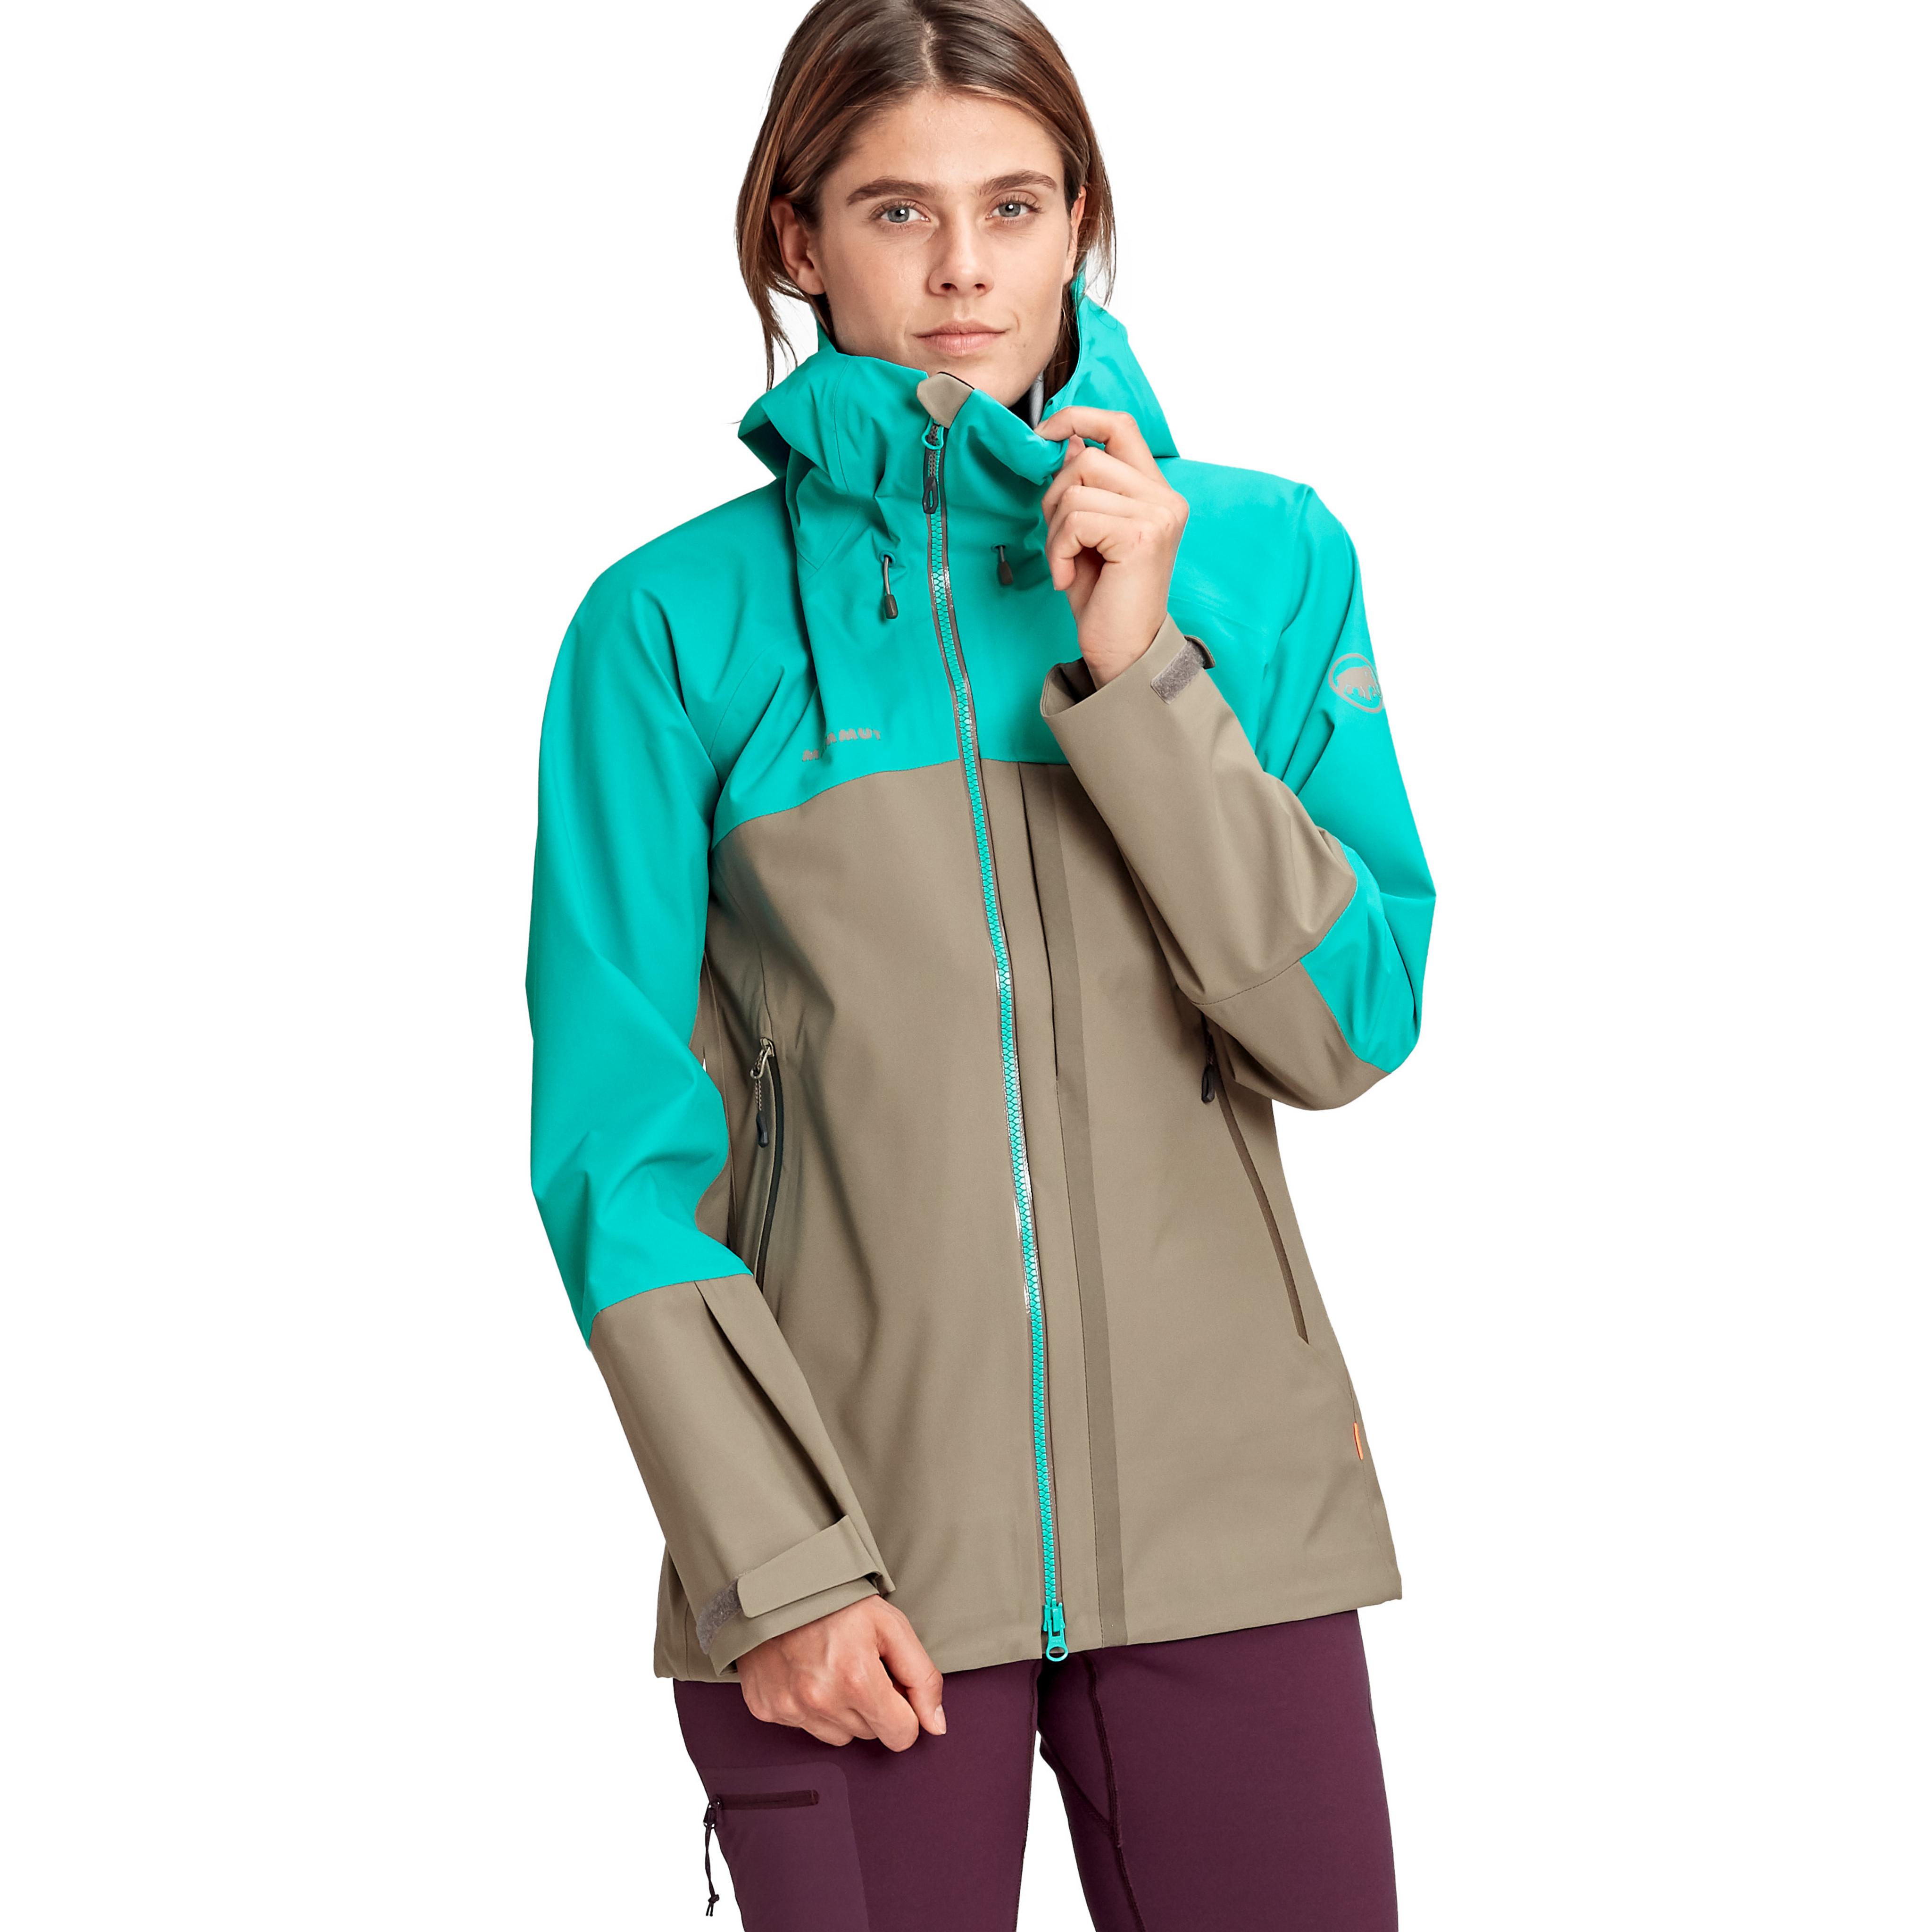 Masao HS Hooded Jacket Women product image